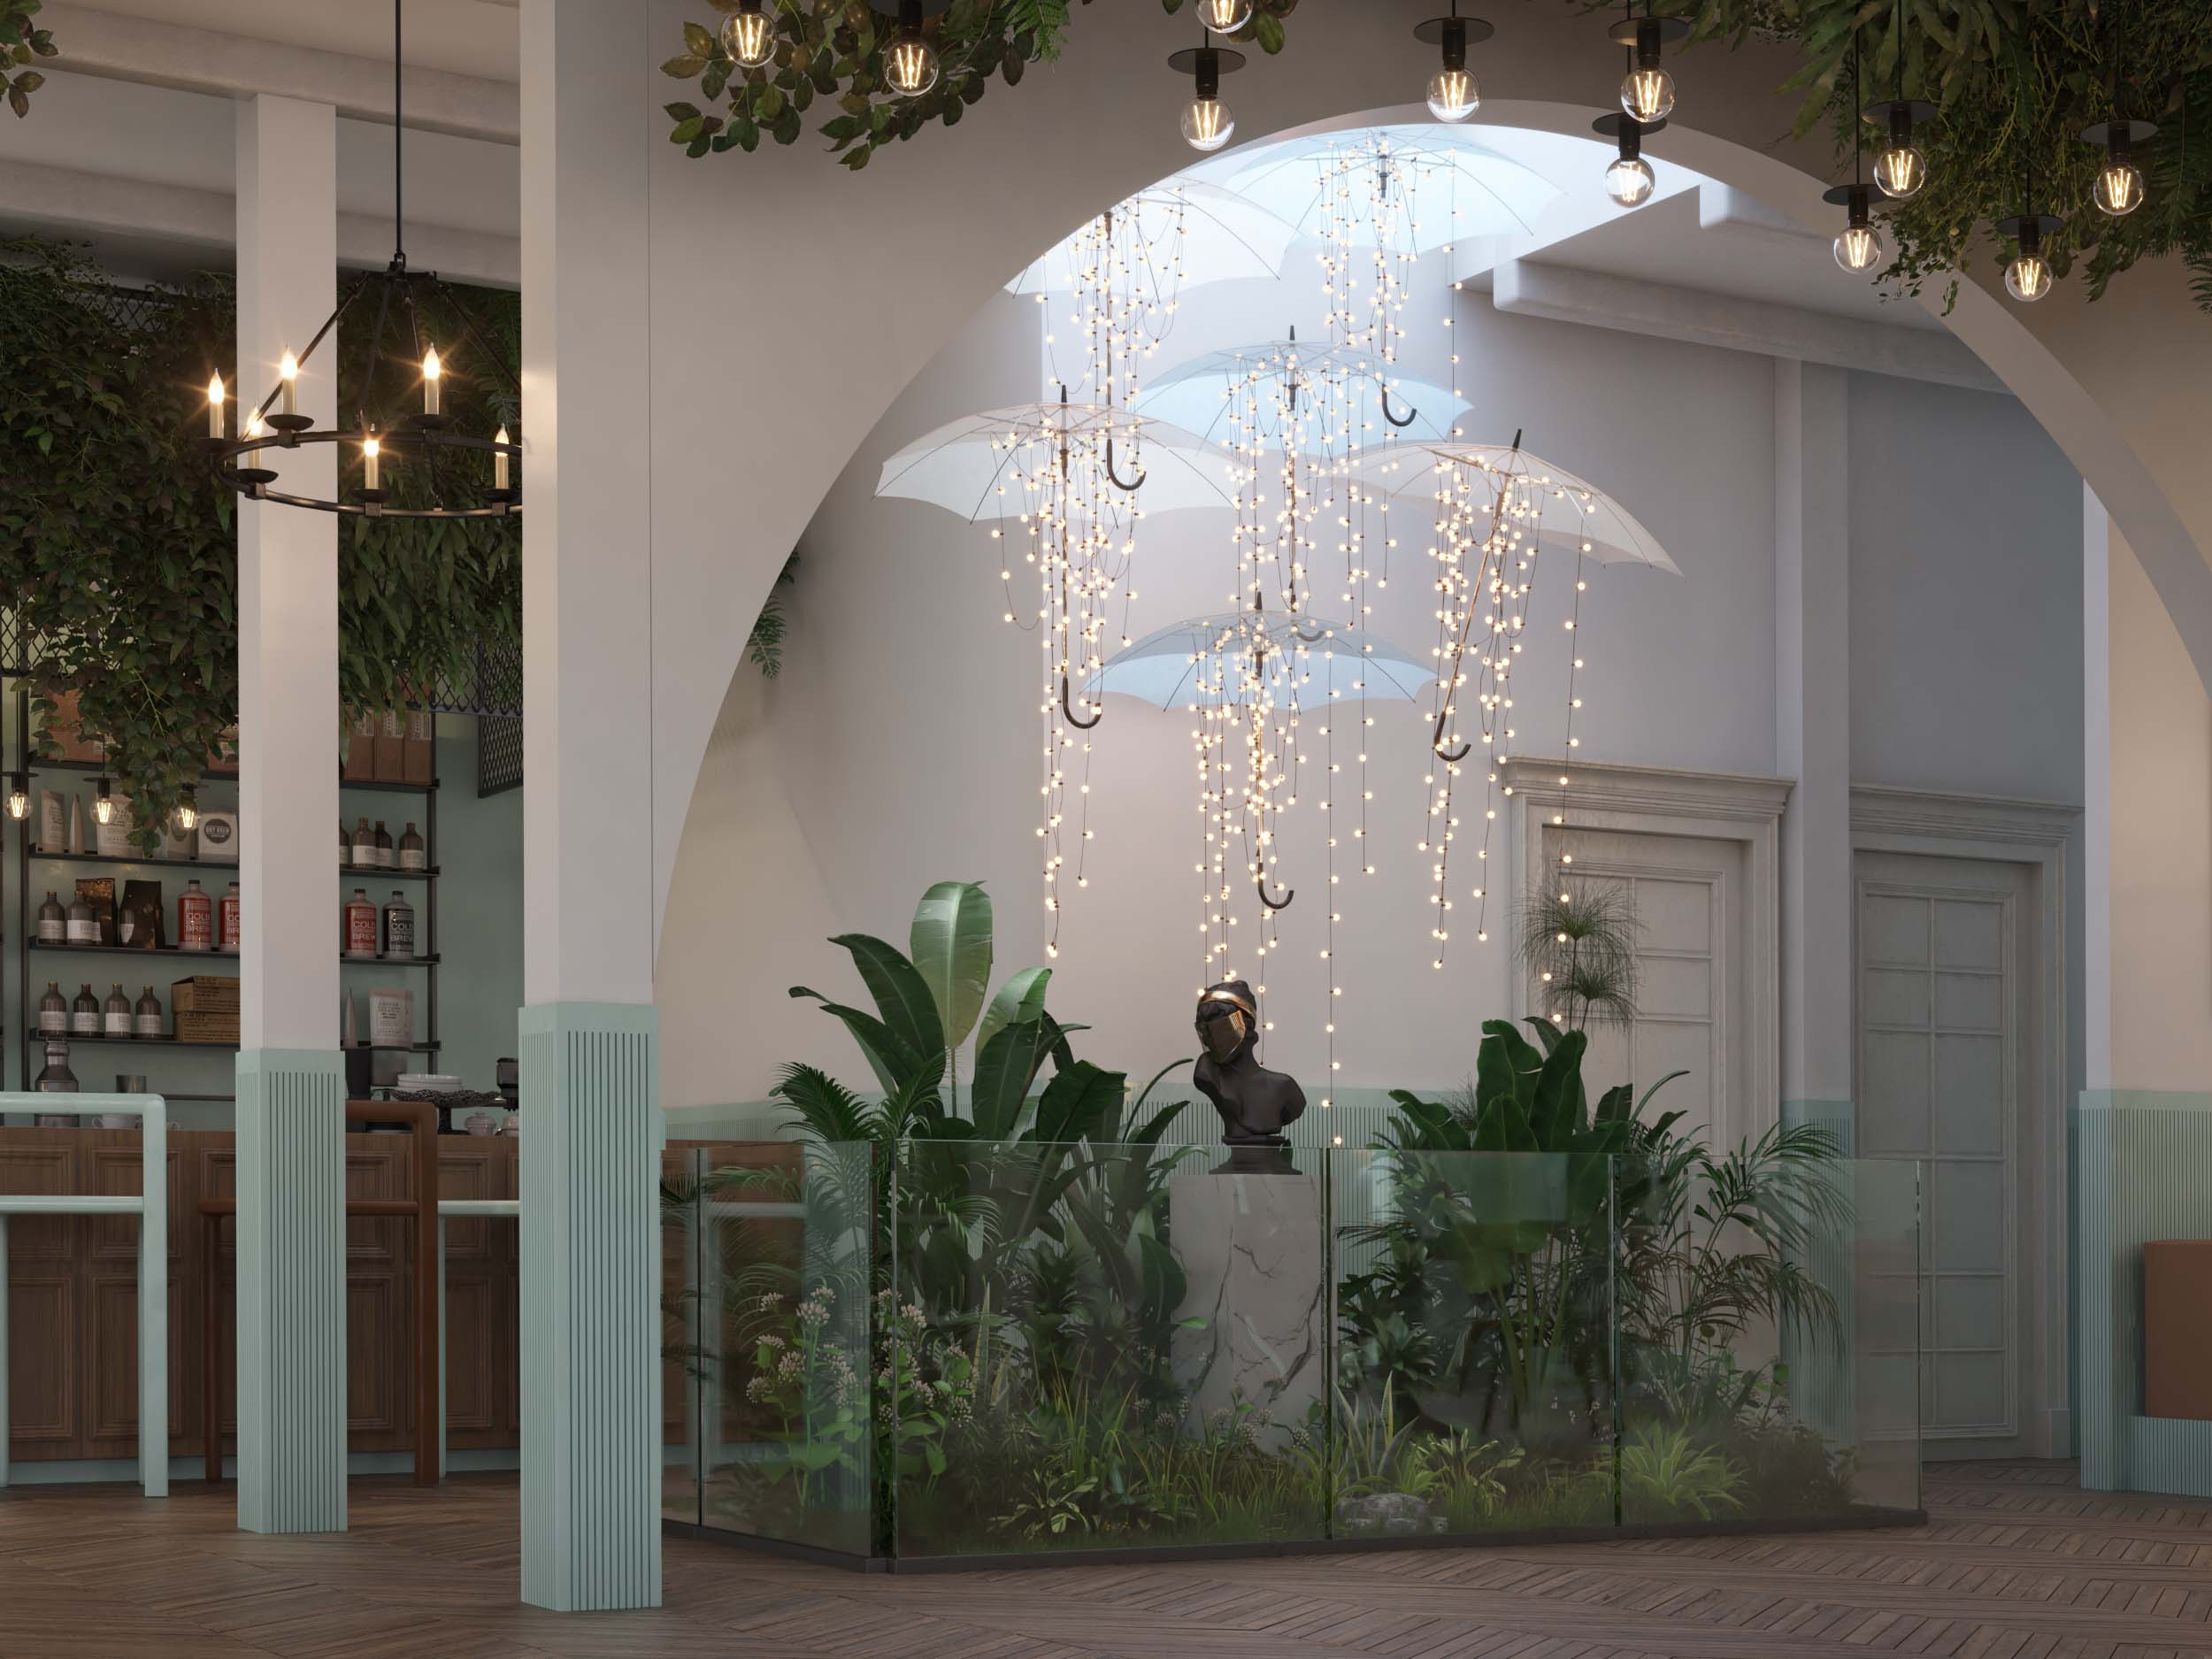 AMERICAN CAFE DESIGN -CAFE DESIGN BY HRarchZ  - UMBRELLA DESIGN- UMBRELLA LIGHT